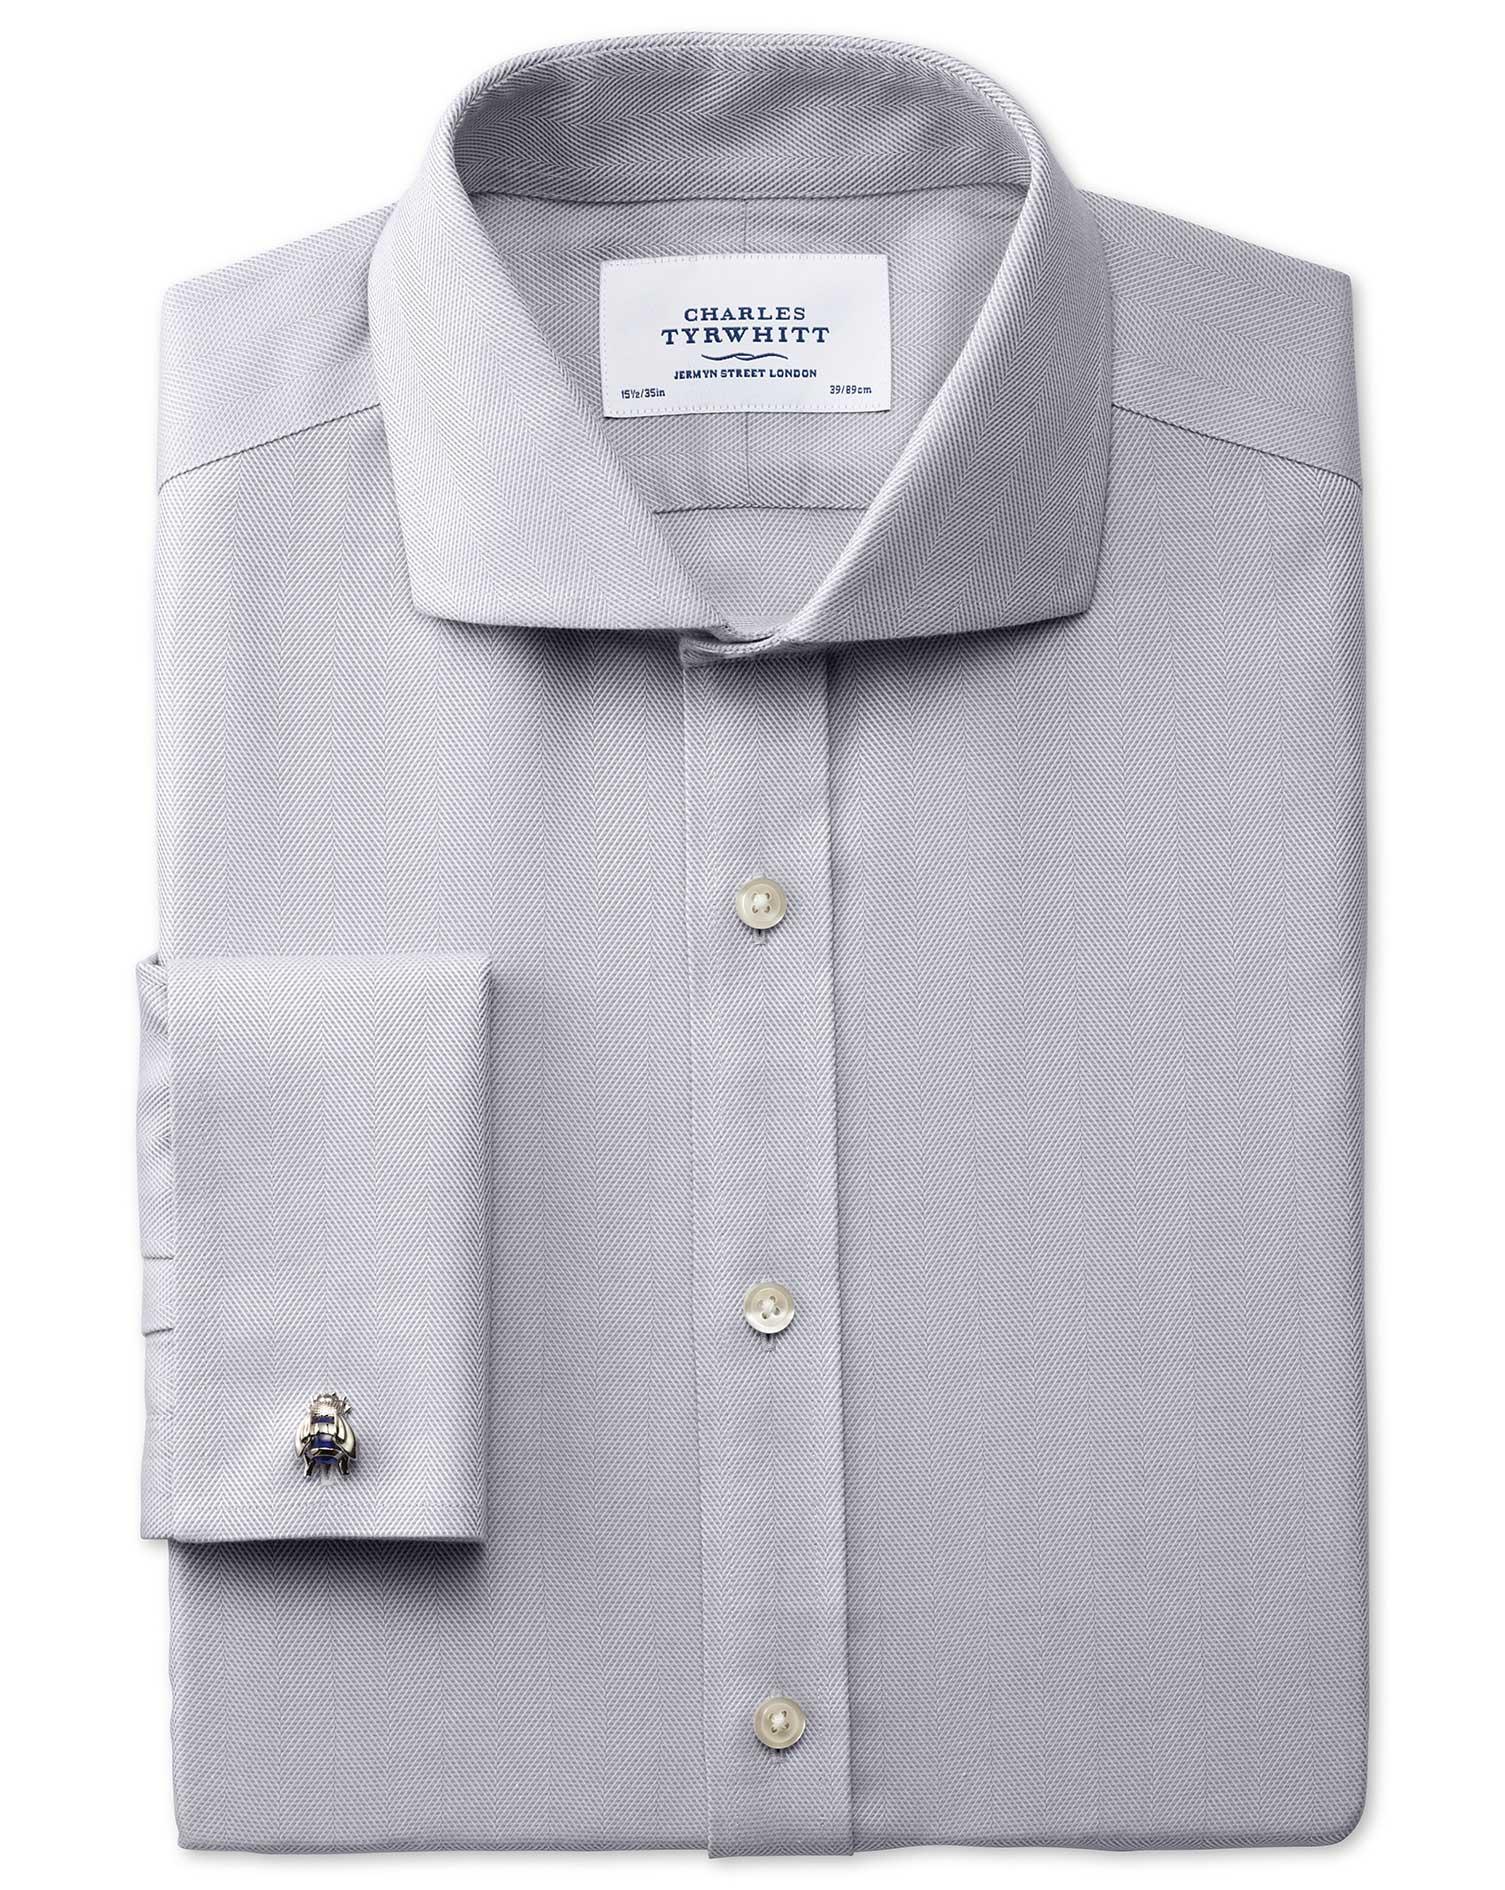 Extra Slim Fit Cutaway Collar Non-Iron Herringbone Grey Cotton Formal Shirt Double Cuff Size 15.5/35